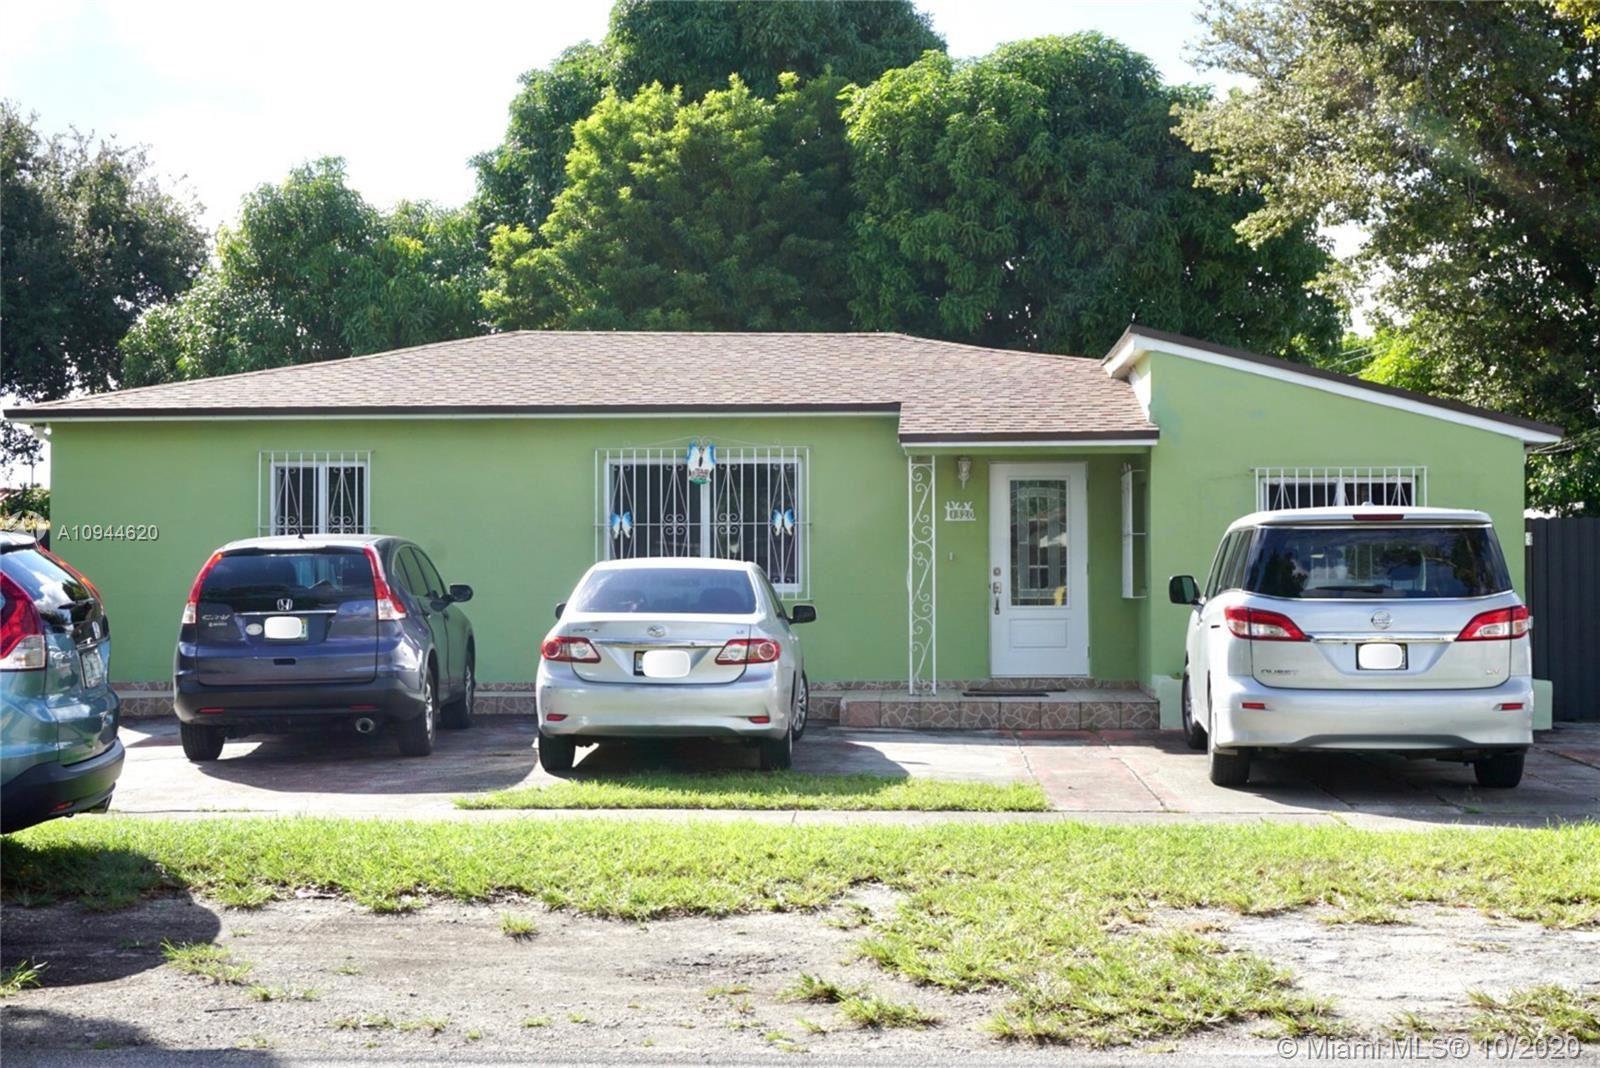 1320 SW 72nd Ave, Miami, FL 33144 - #: A10944620